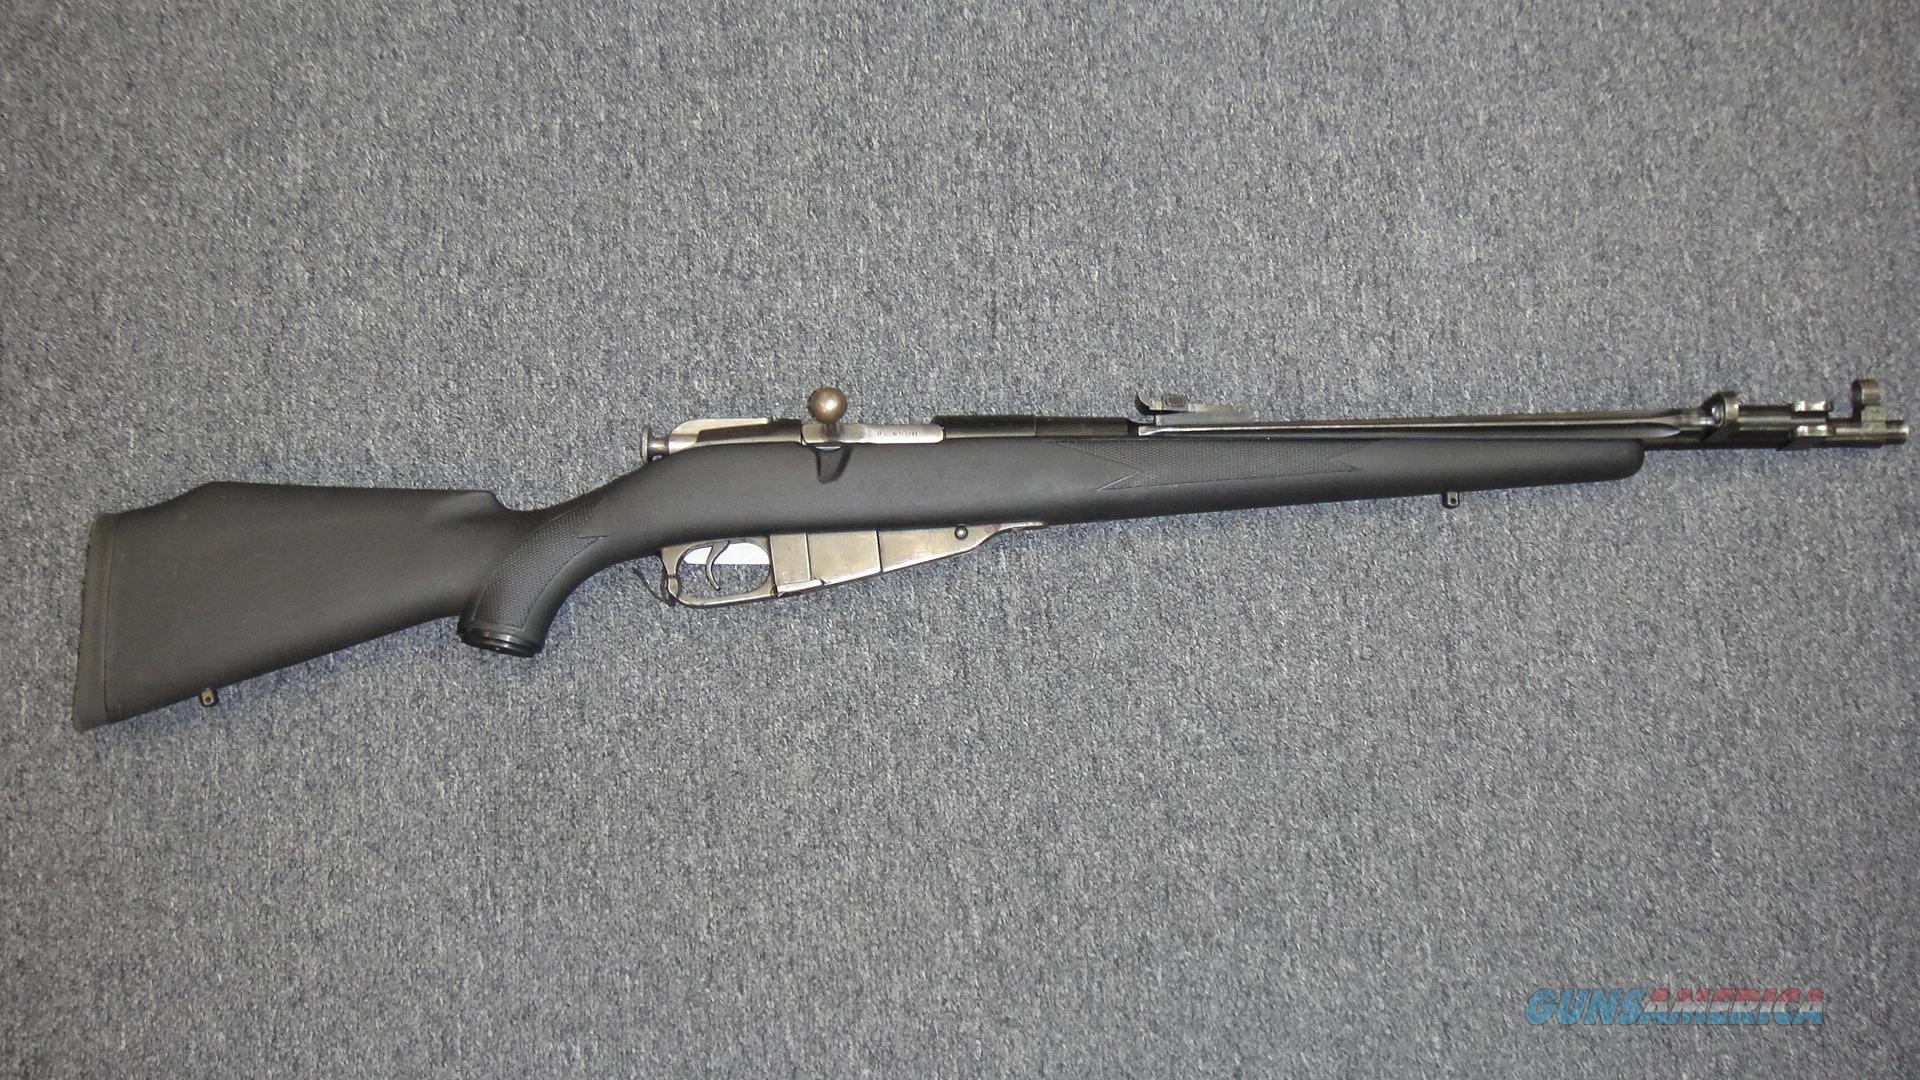 Chinese/CAI M53 w/ bayonet  Guns > Rifles > Mosin-Nagant Rifles/Carbines